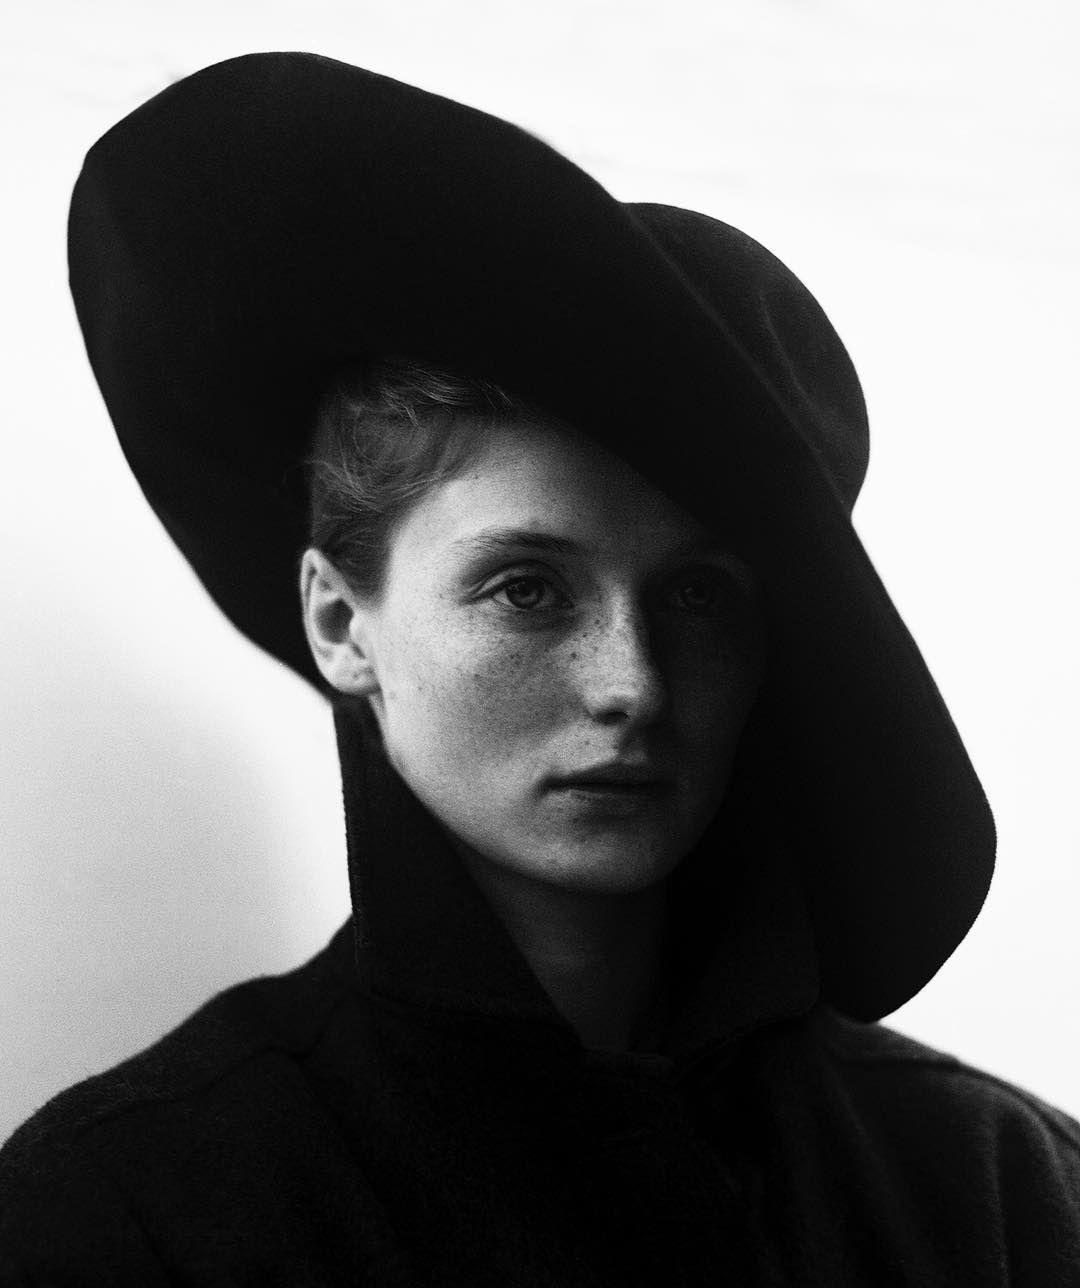 Impressive black and white portrait photography by jack davison inspiration photography